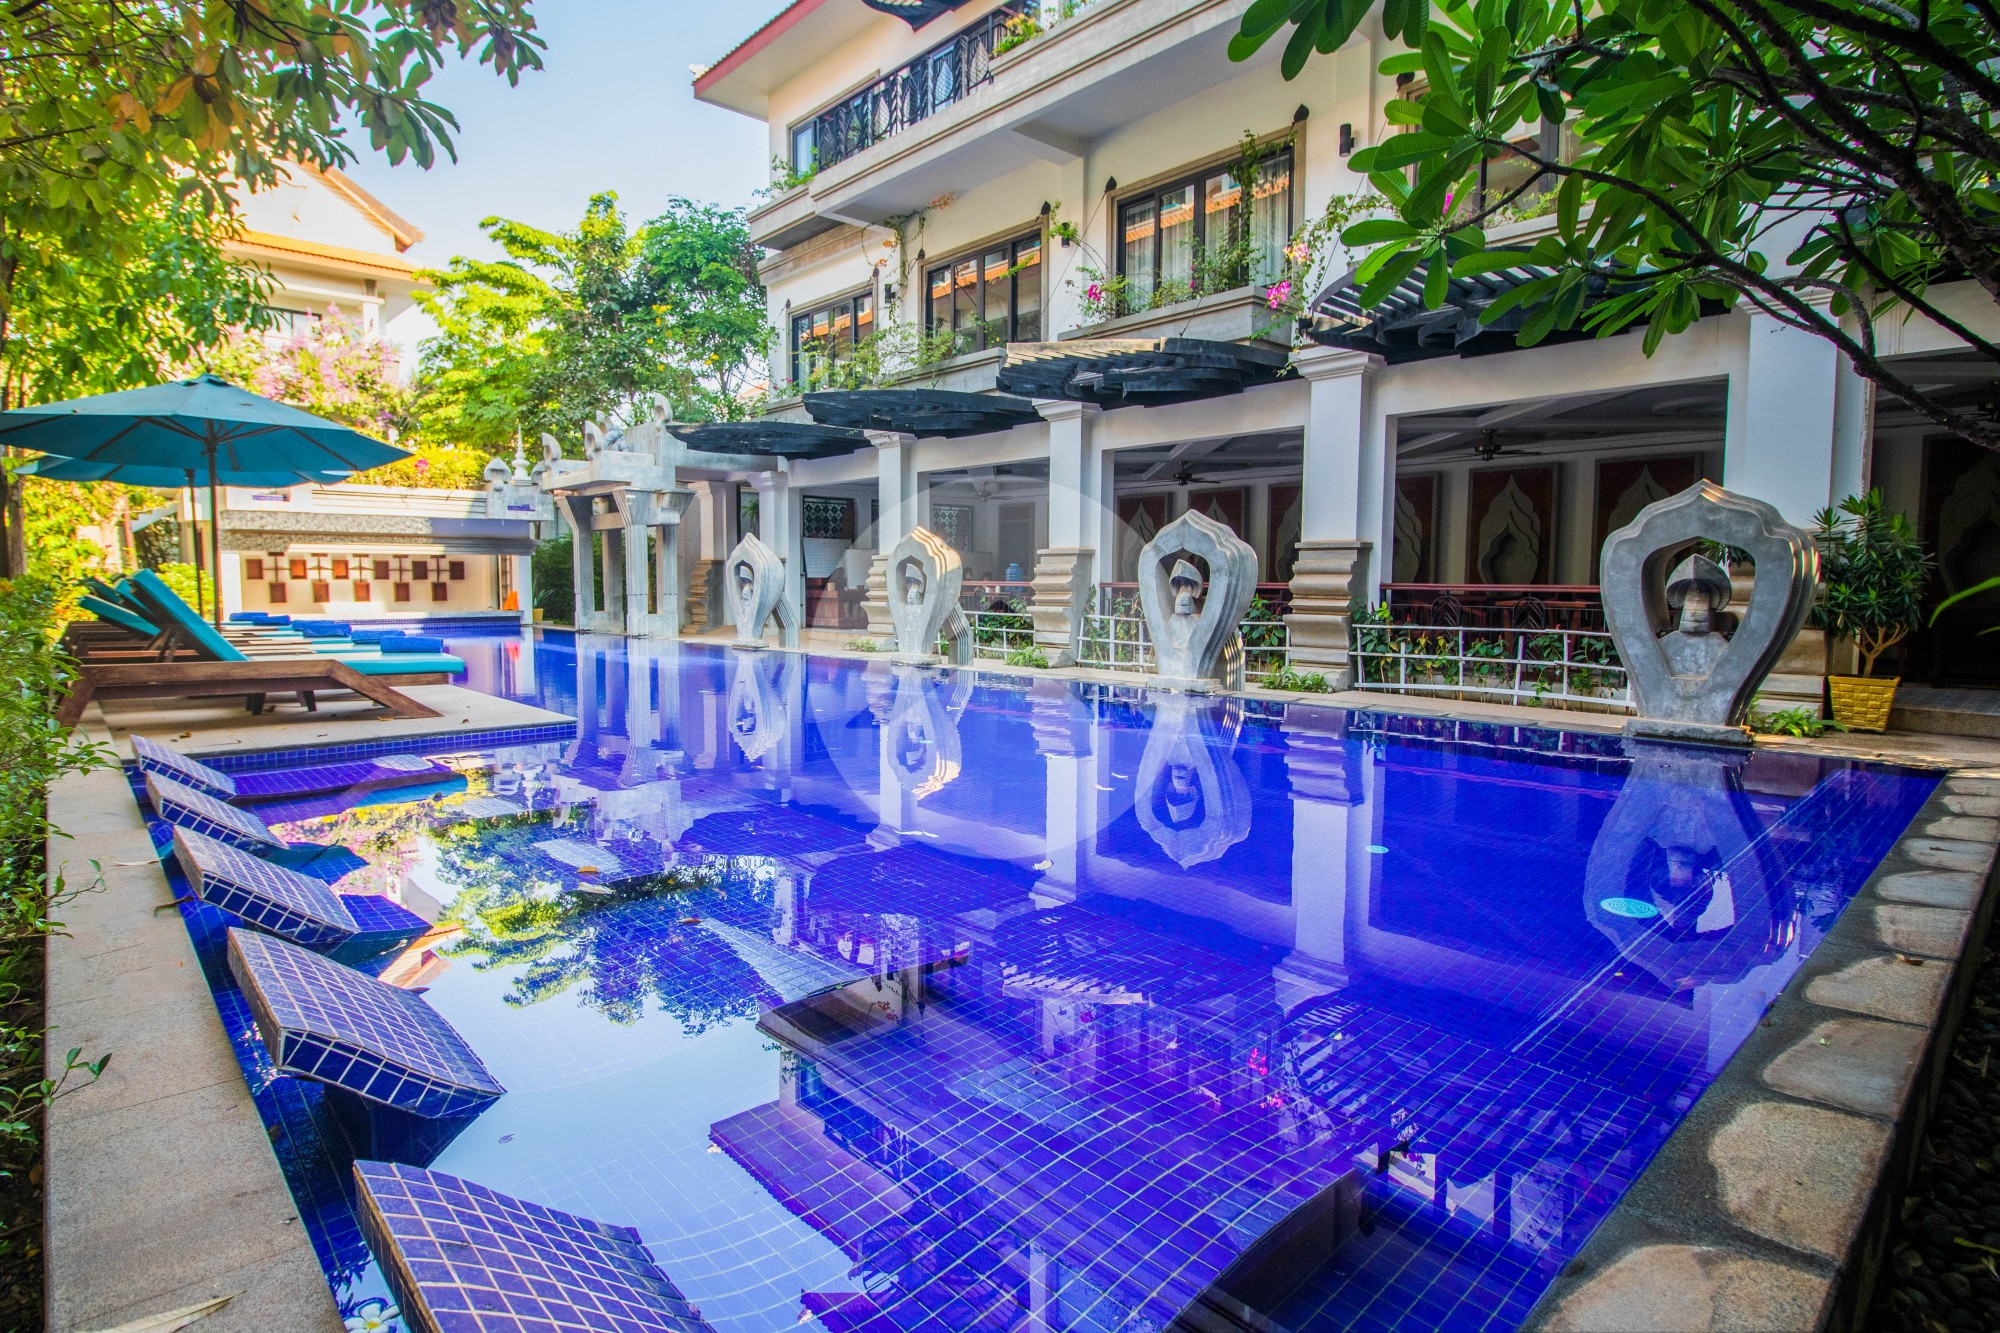 3 Bed Serviced Studio Apartment For Rent - Svay Dangkum, Siem Reap